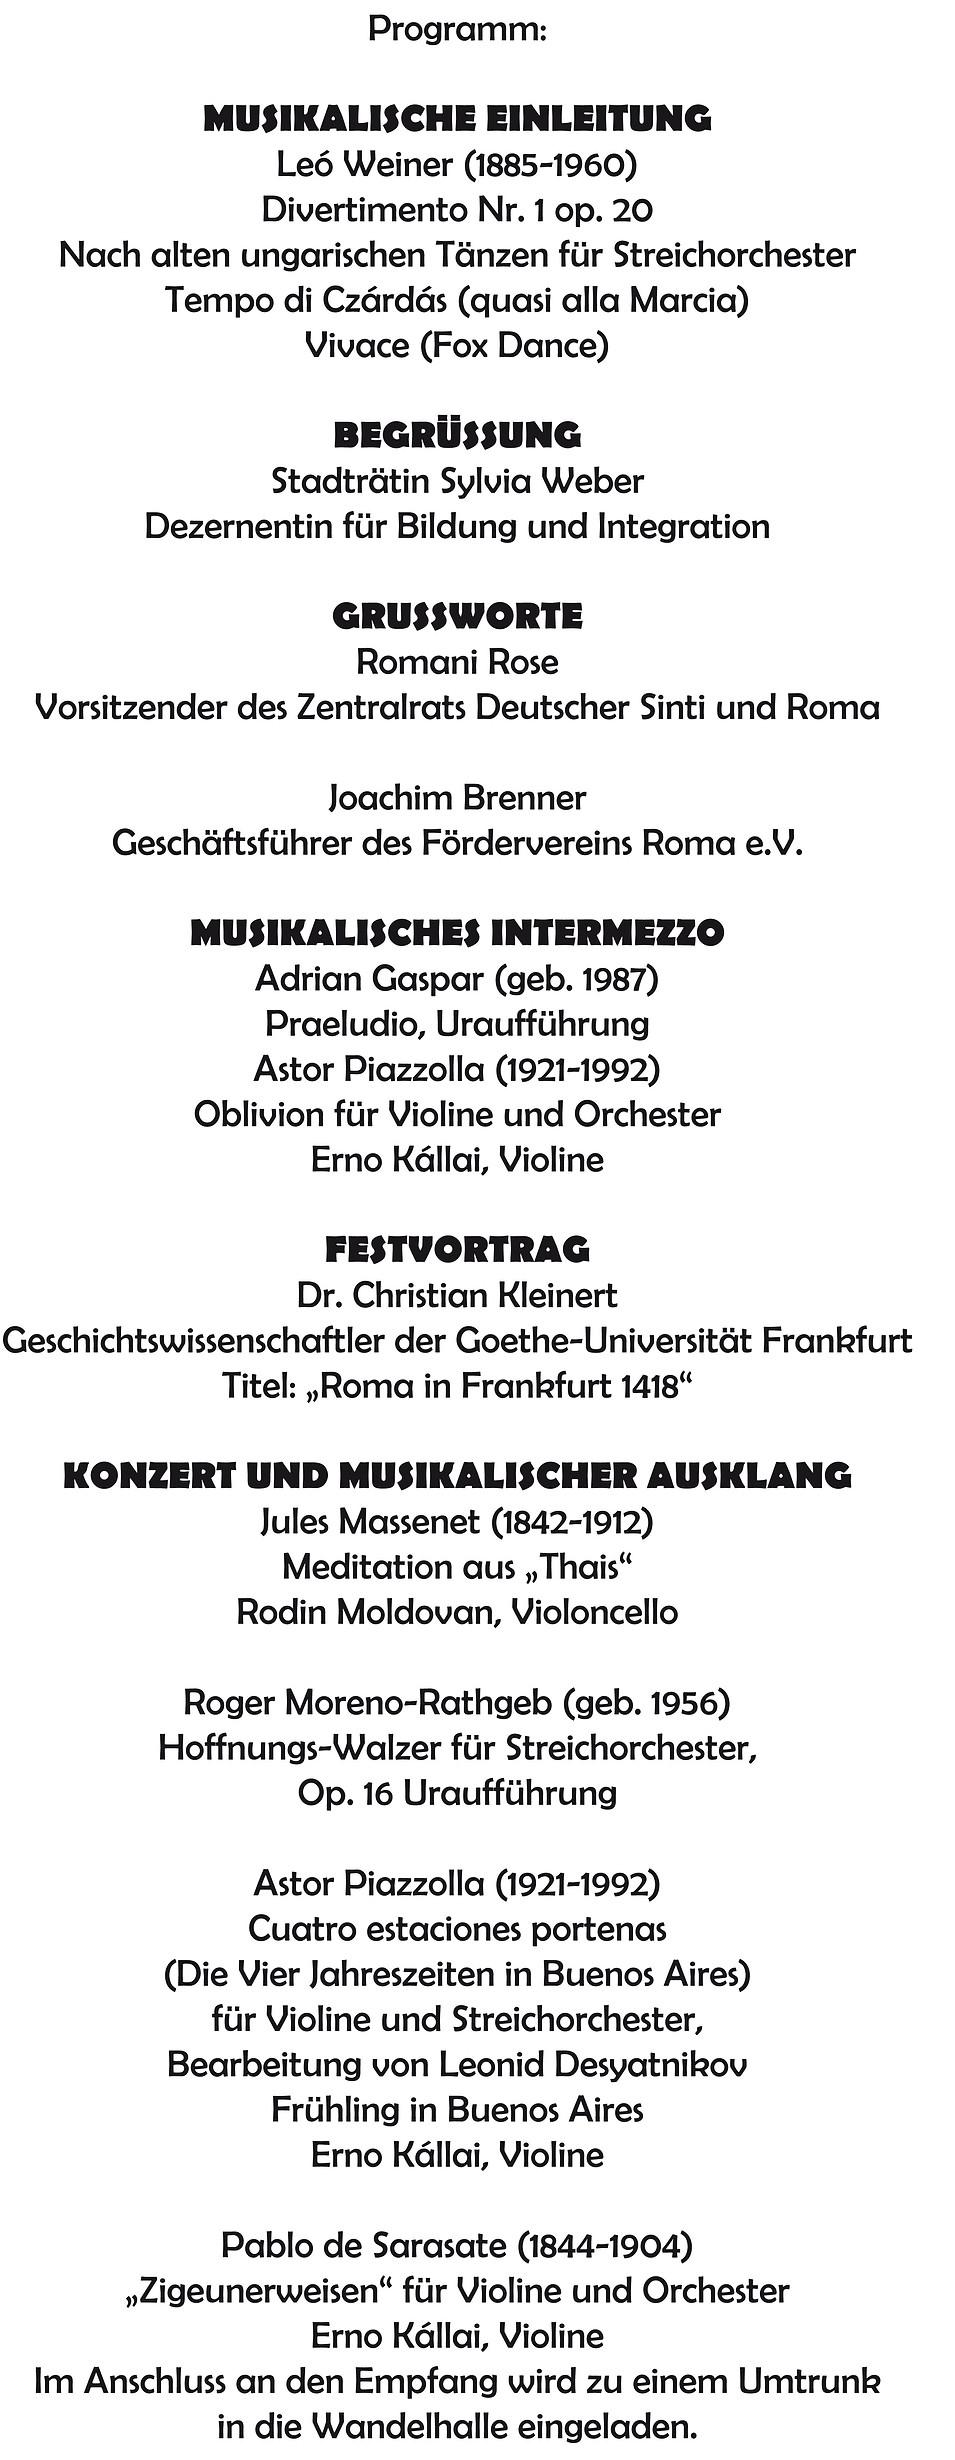 Programm-Paulskirche.jpg